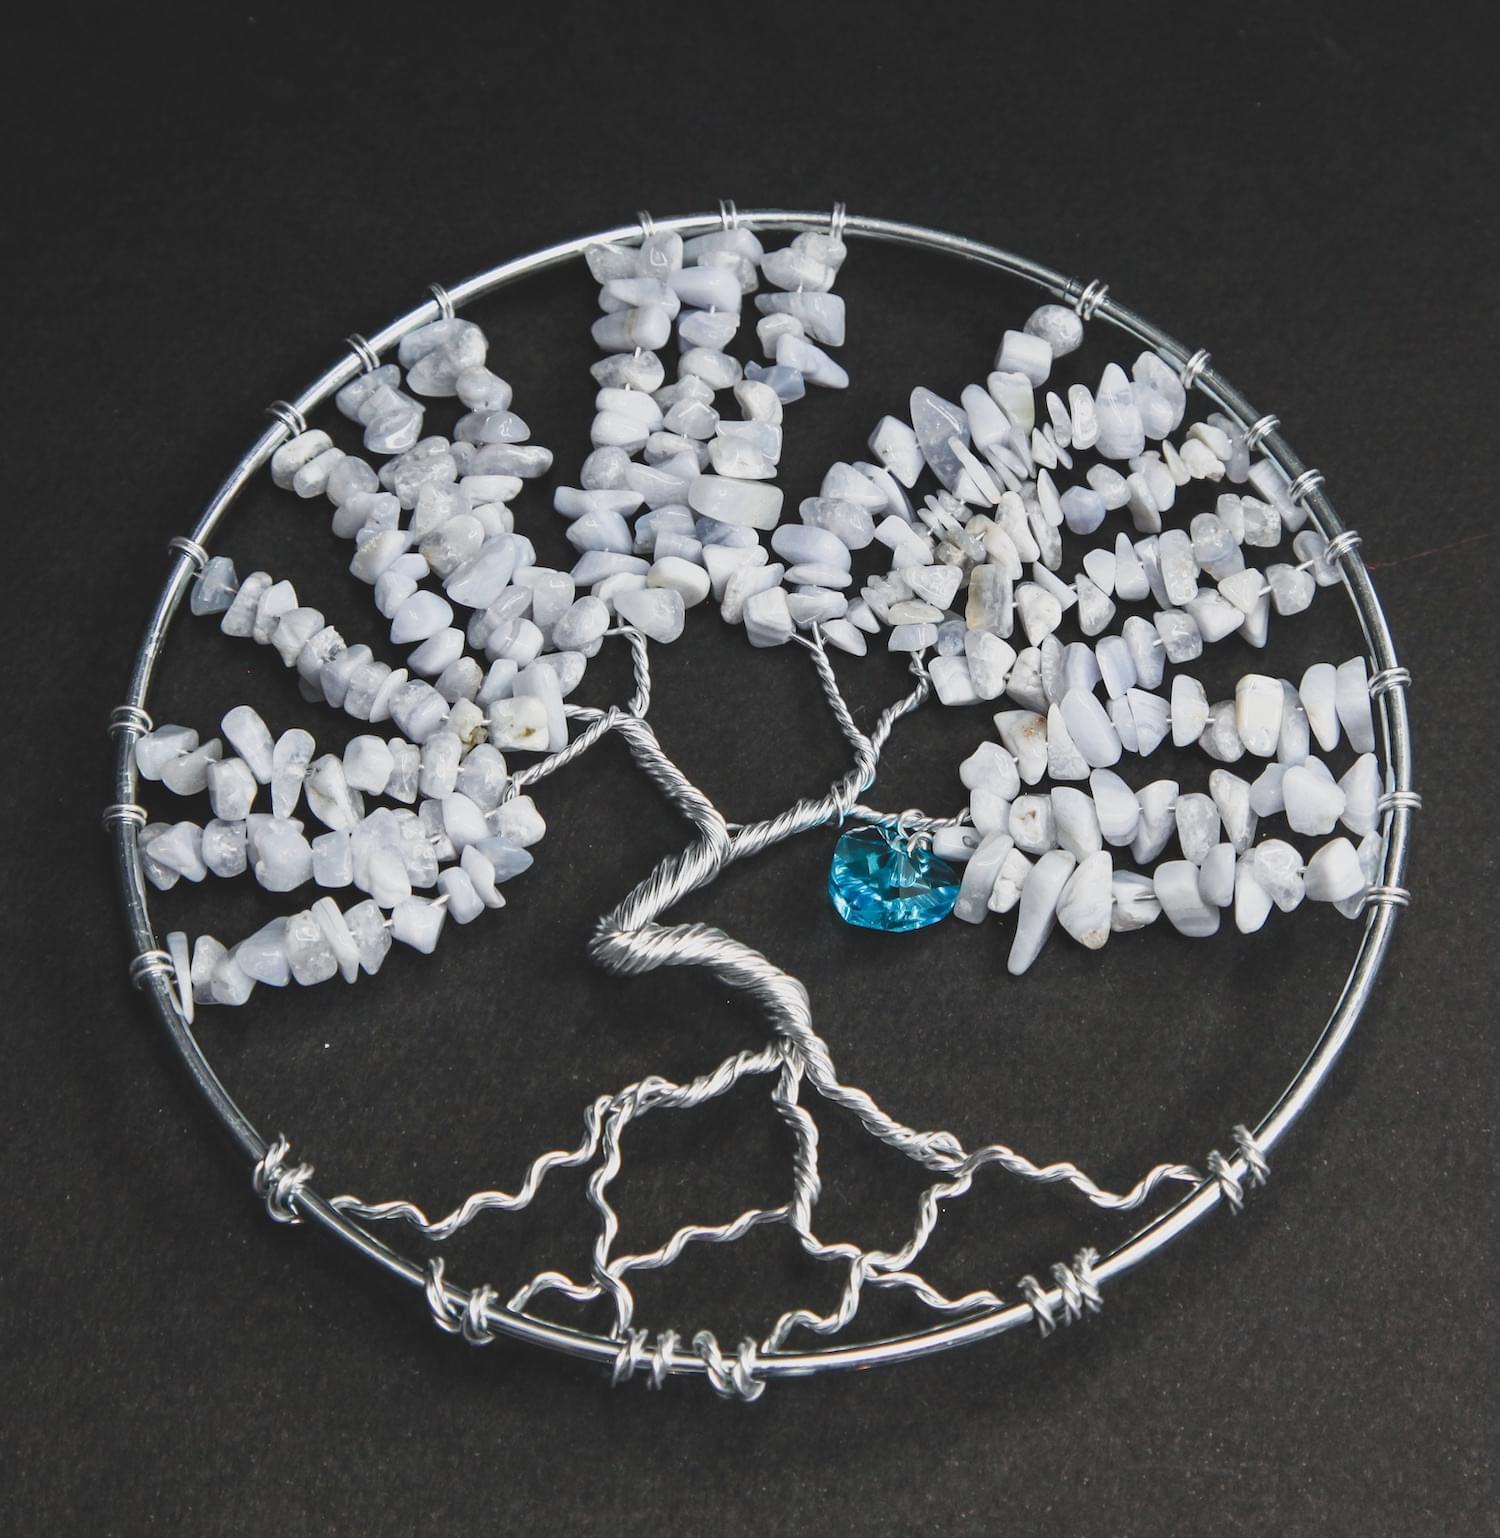 wishing_tree_gemstone_blue_lace_agate_01.min